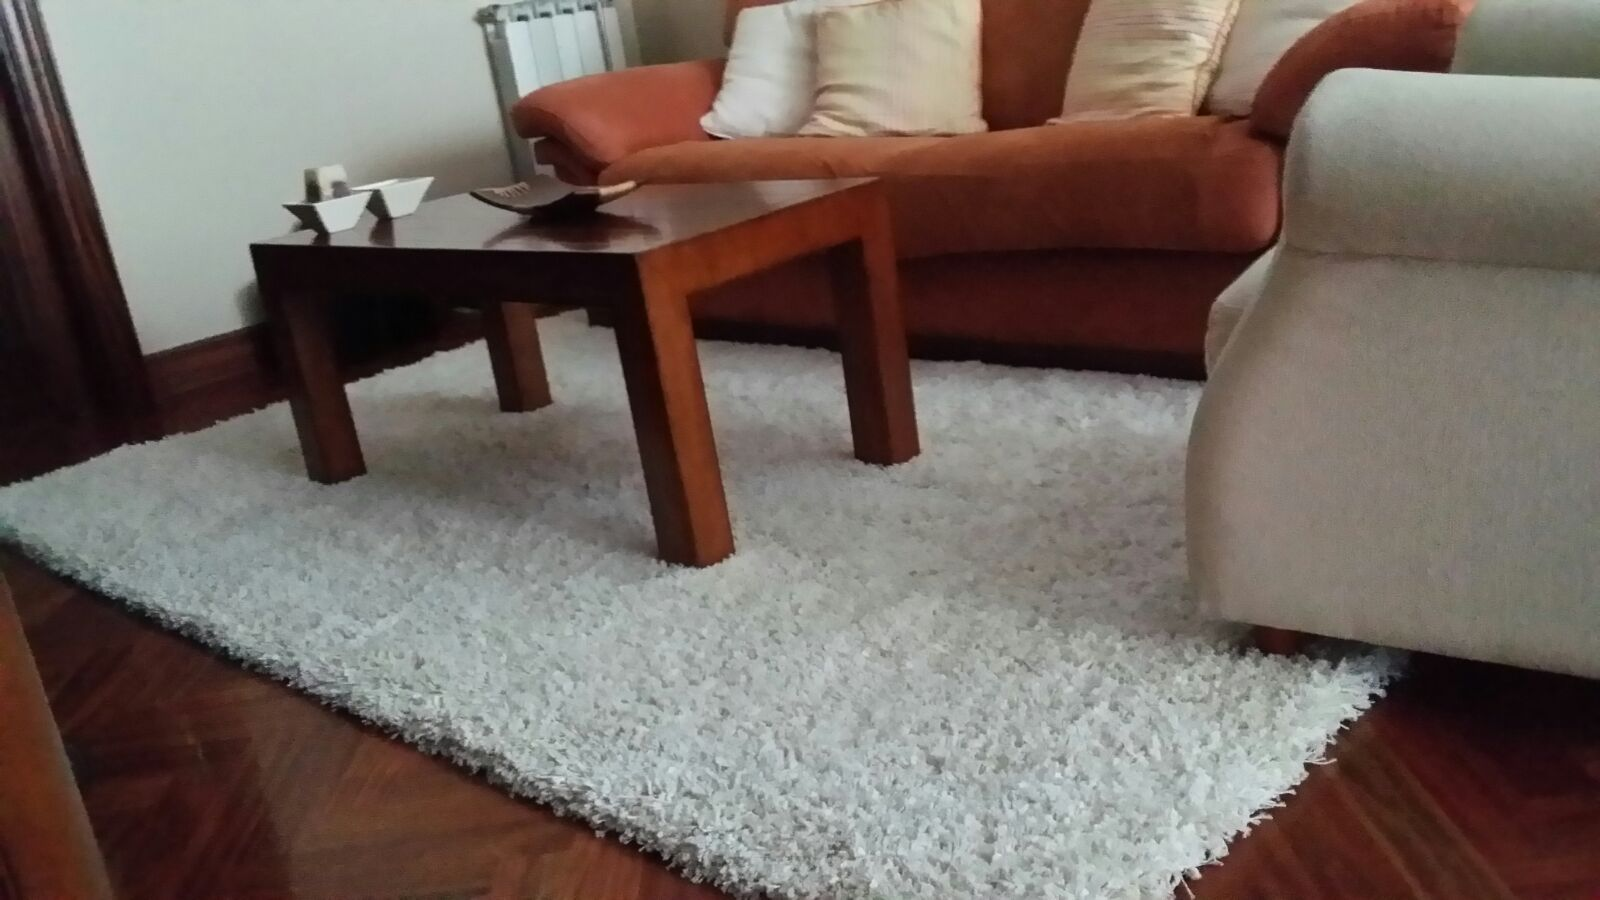 M s de 25 ideas incre bles sobre alfombras pelo largo en - Limpiar alfombra pelo largo ...